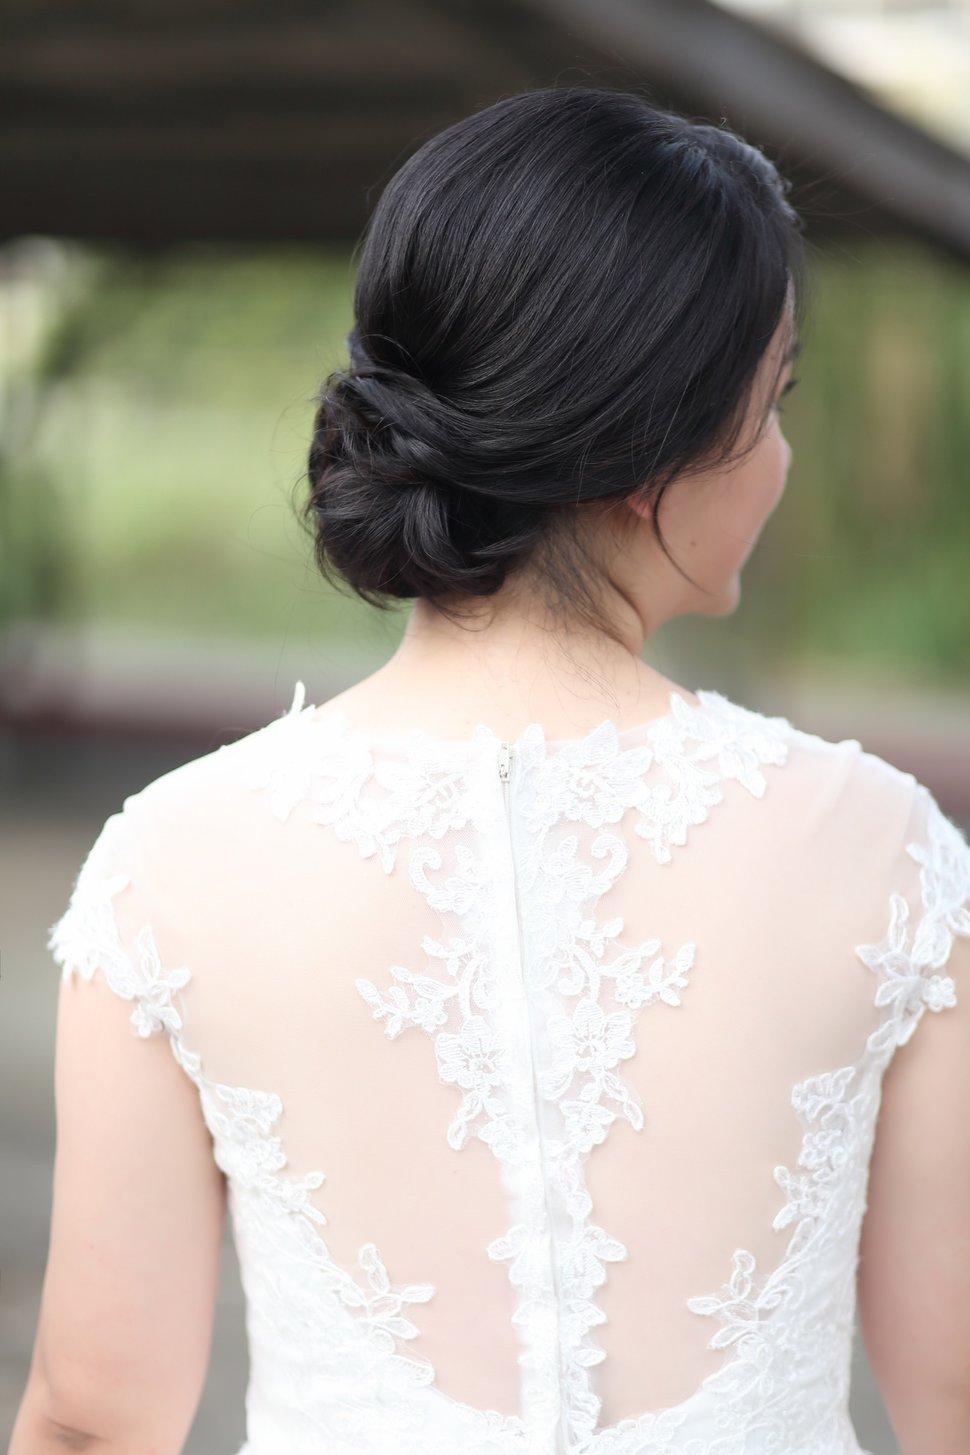 Wed_046 - Dora Lin Makeup新娘秘書《結婚吧》